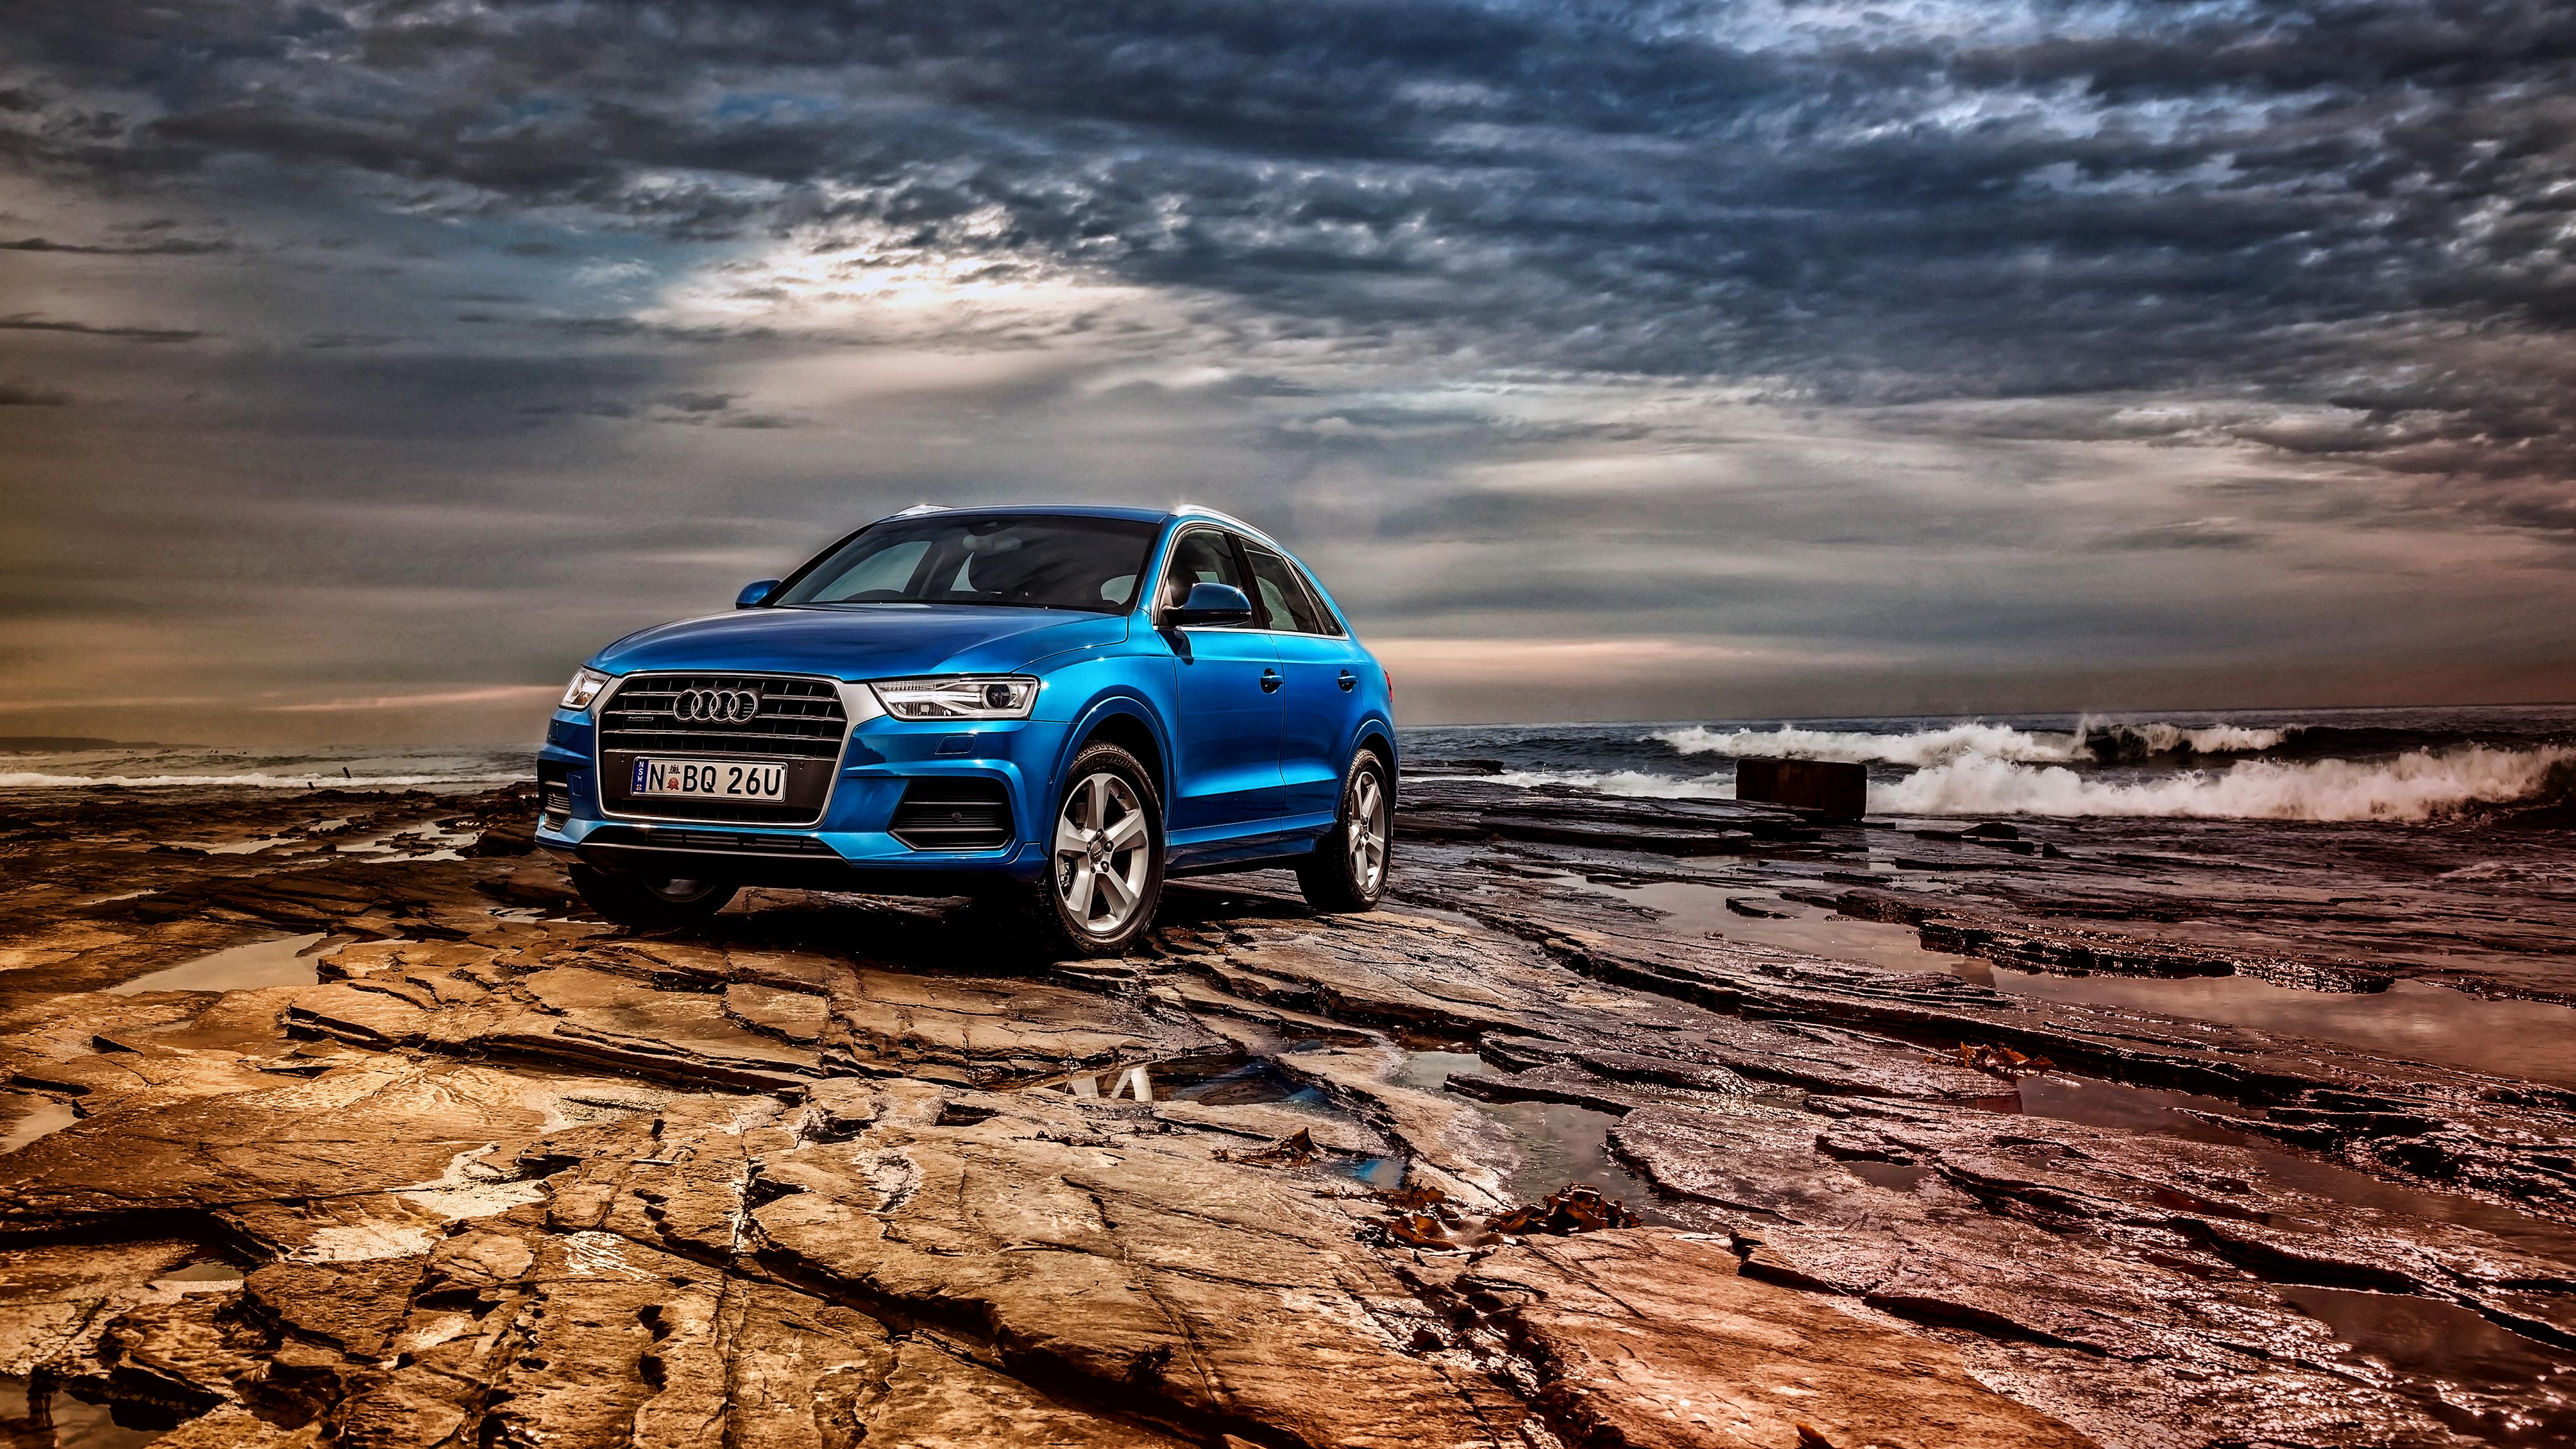 Audi Q3 4k Ultra Hd Wallpaper Background Image 4096x2304